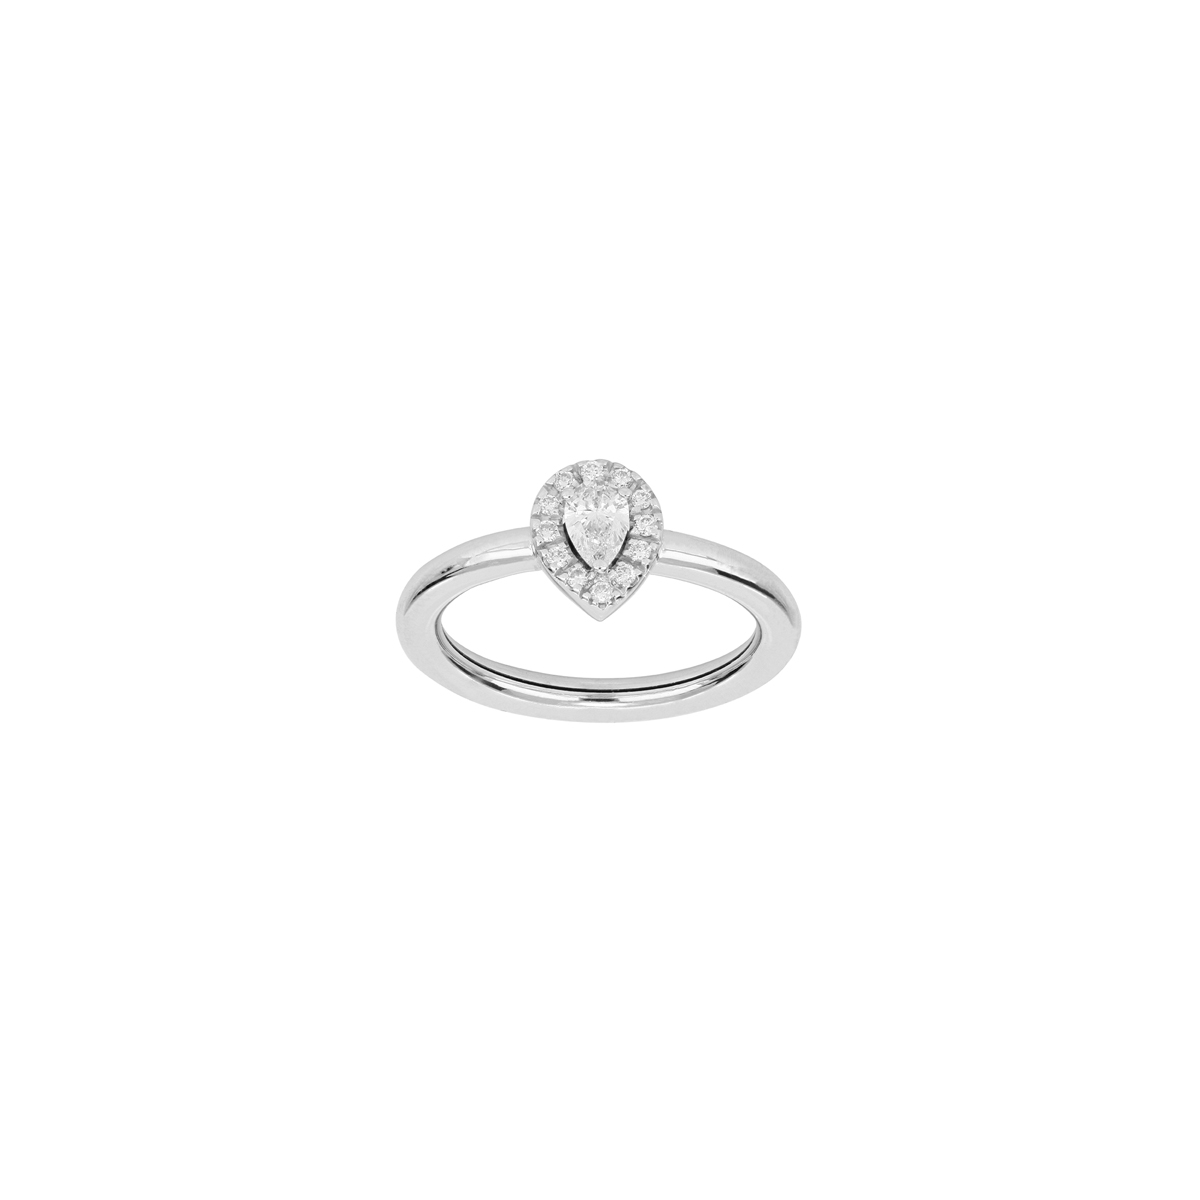 White Gold Pear-Cut Diamond Halo Ring